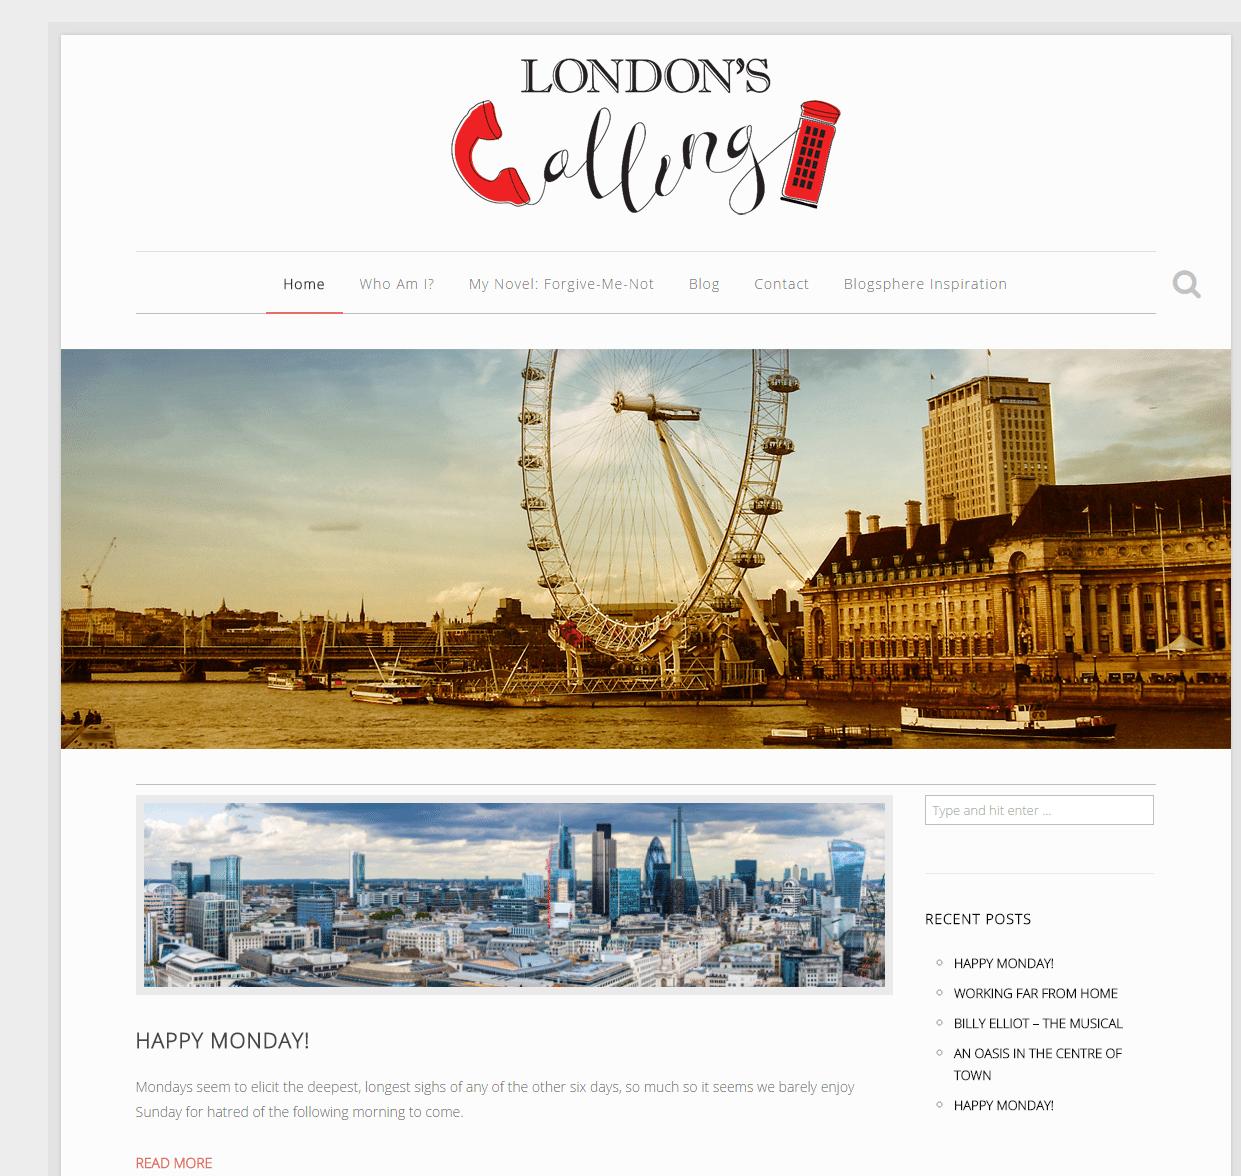 http://www.londonscalling.org.uk/